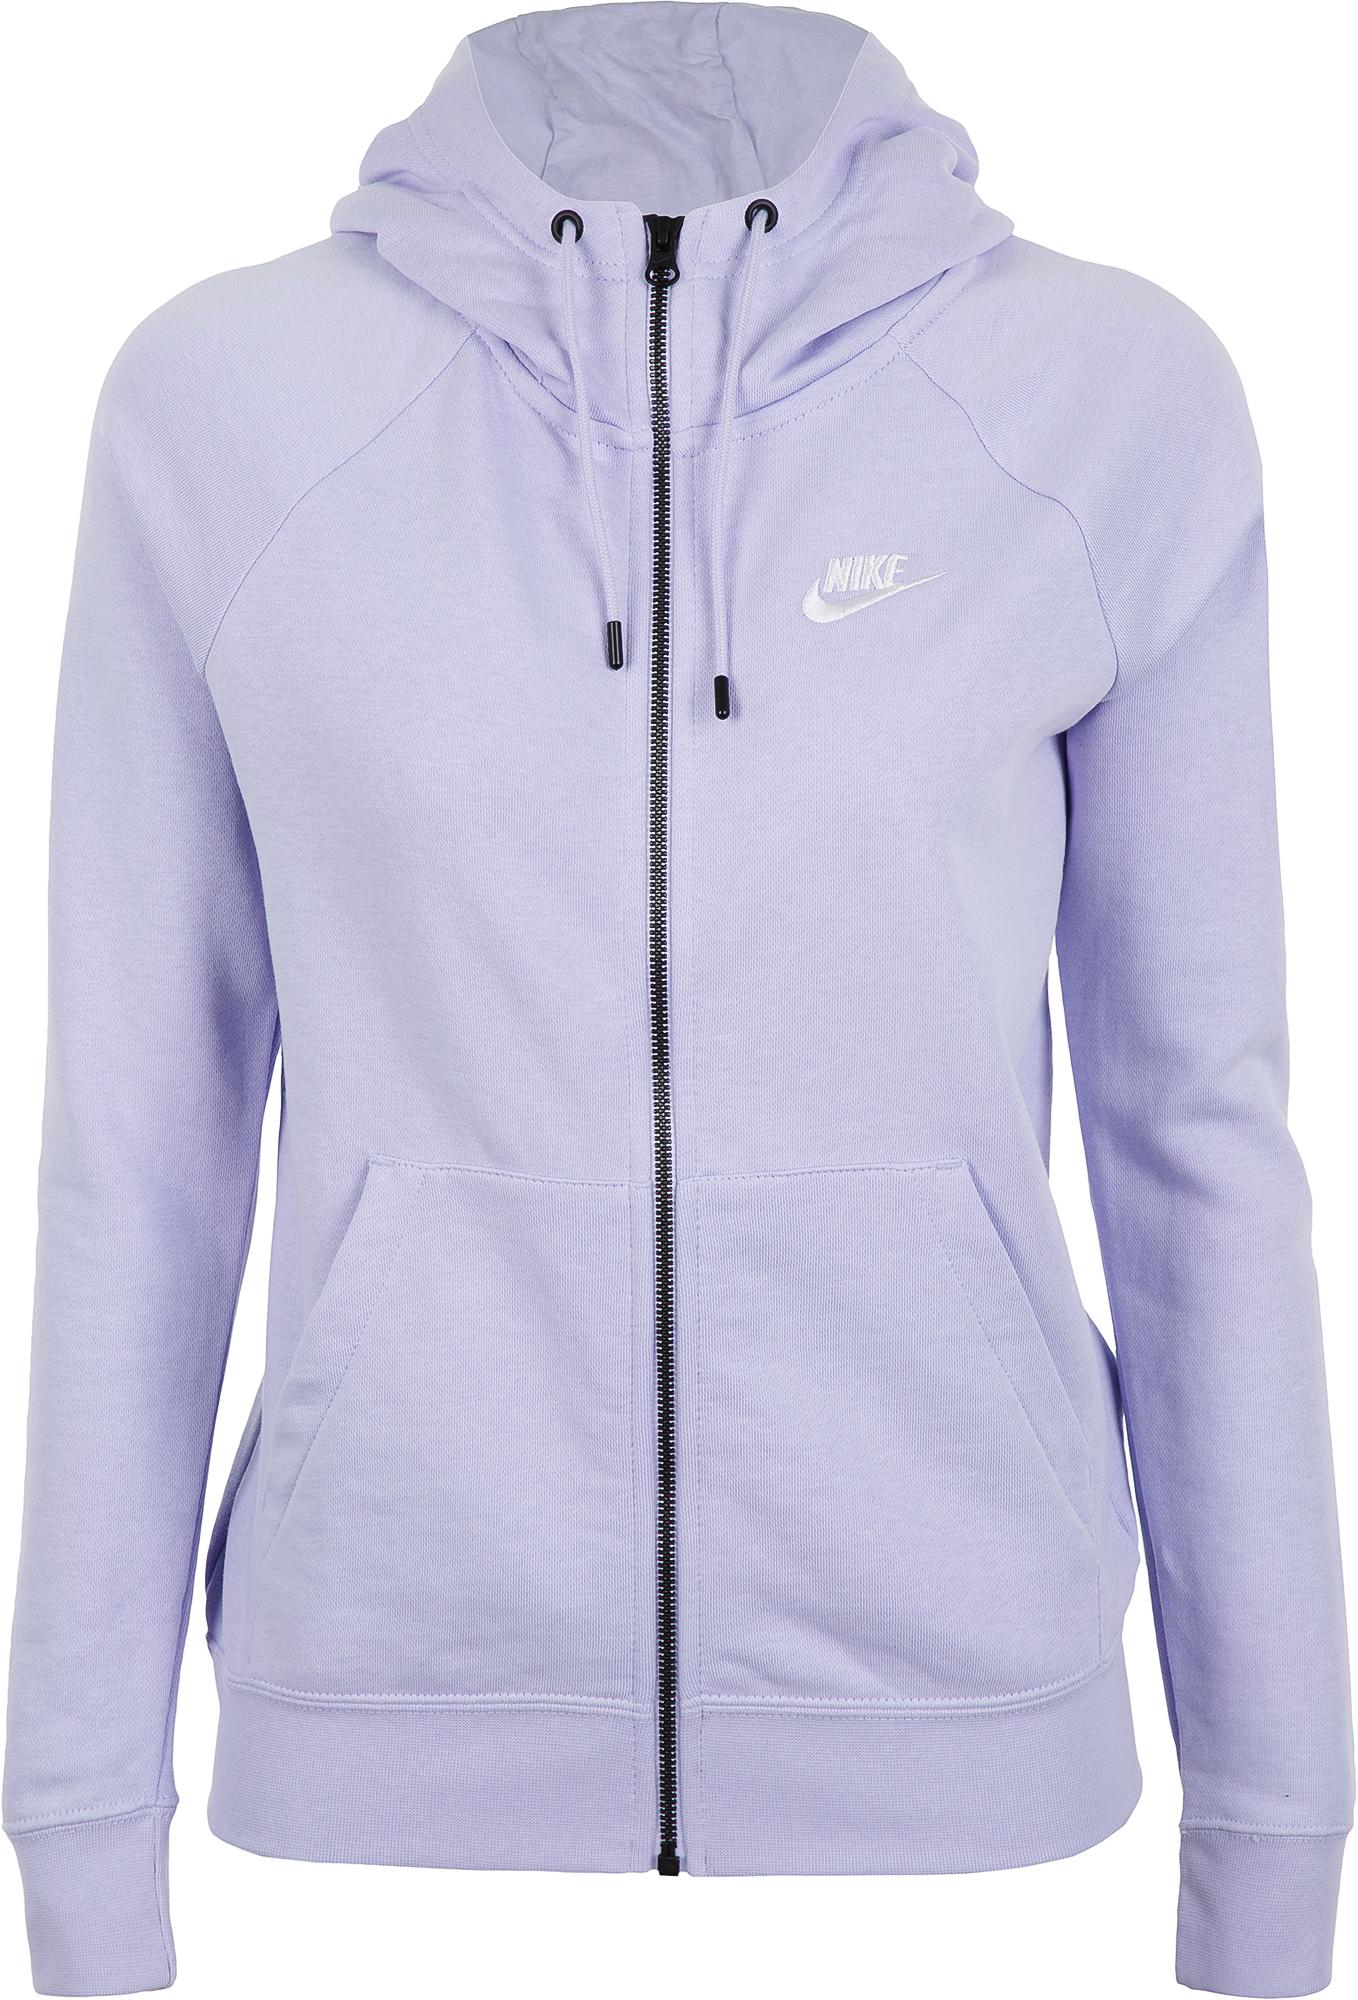 Nike Толстовка женская Nike Sportswear Essential, размер 46-48 цены онлайн